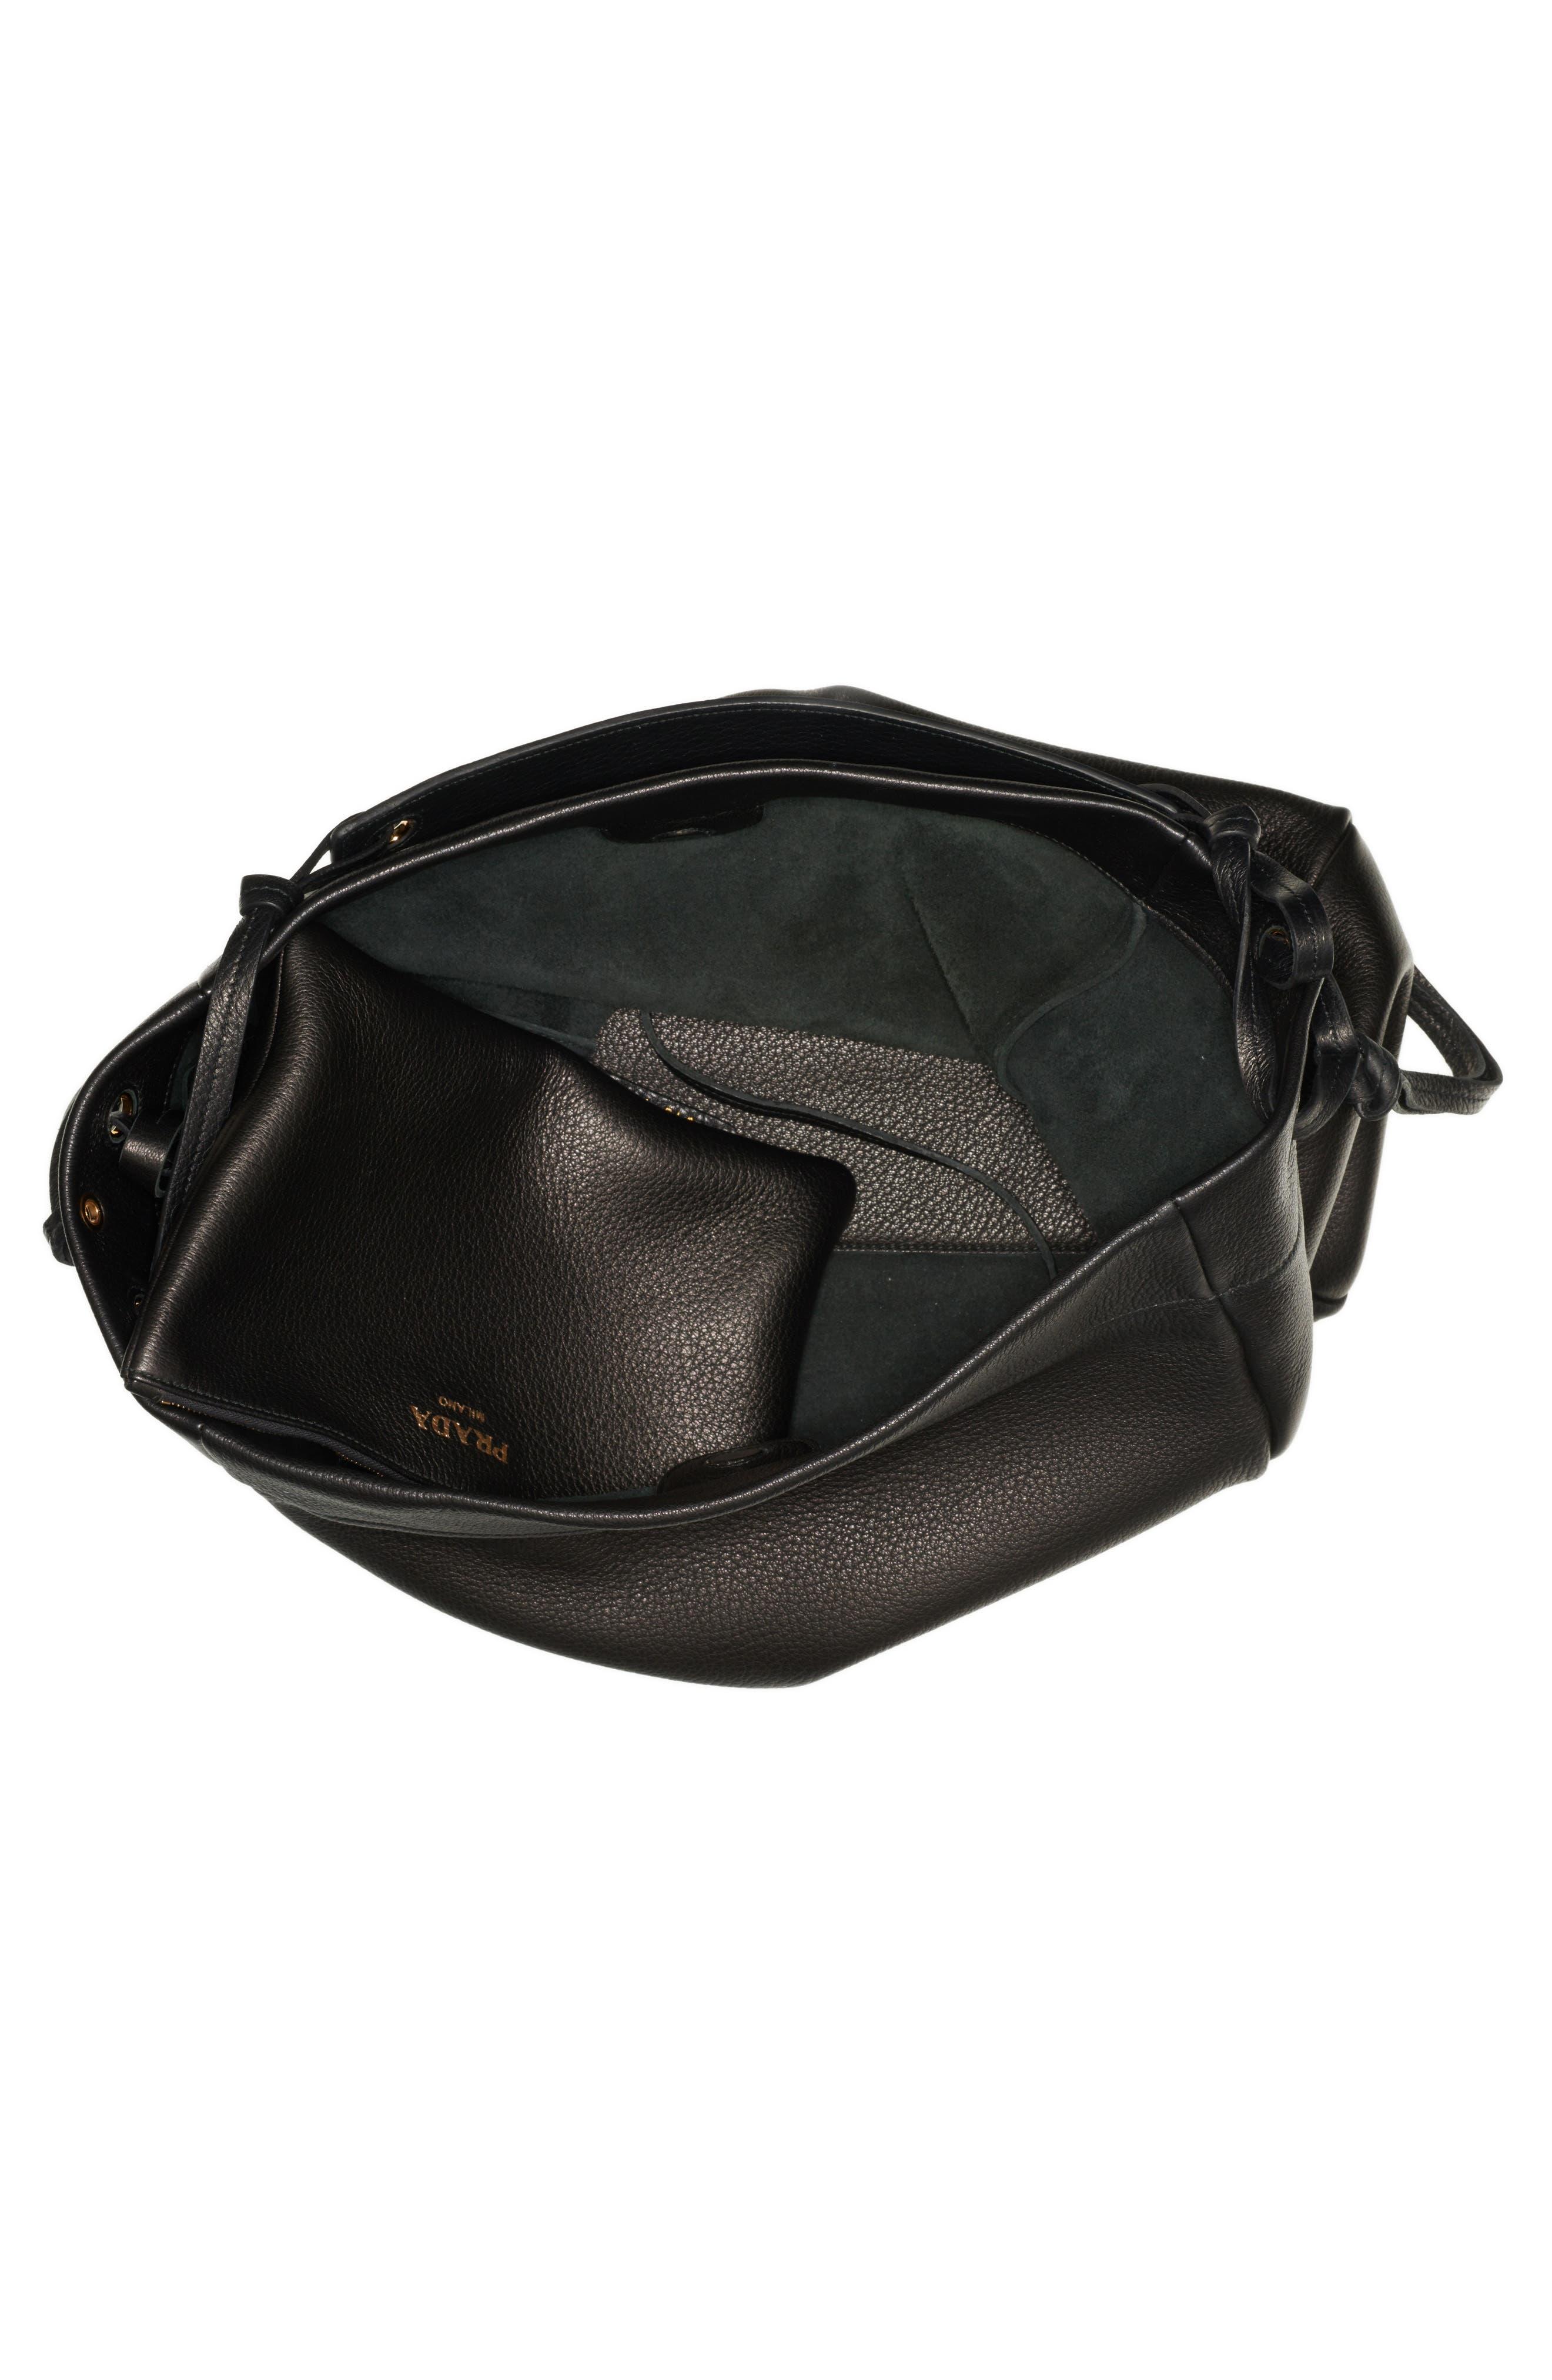 PRADA,                             Large Deerskin Leather Hobo,                             Alternate thumbnail 3, color,                             001